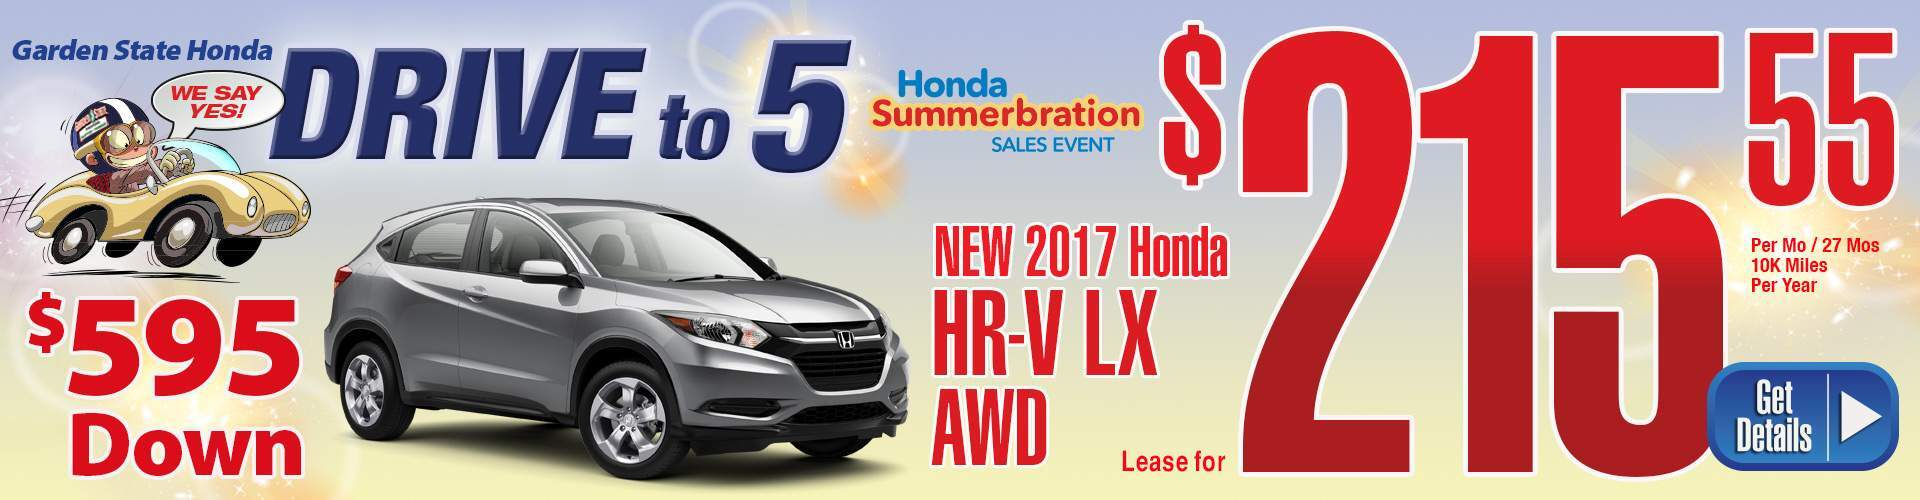 Honda Of Tenafly >> Clifton Honda Dealer, Passaic Used Cars, Passaic Auto ...